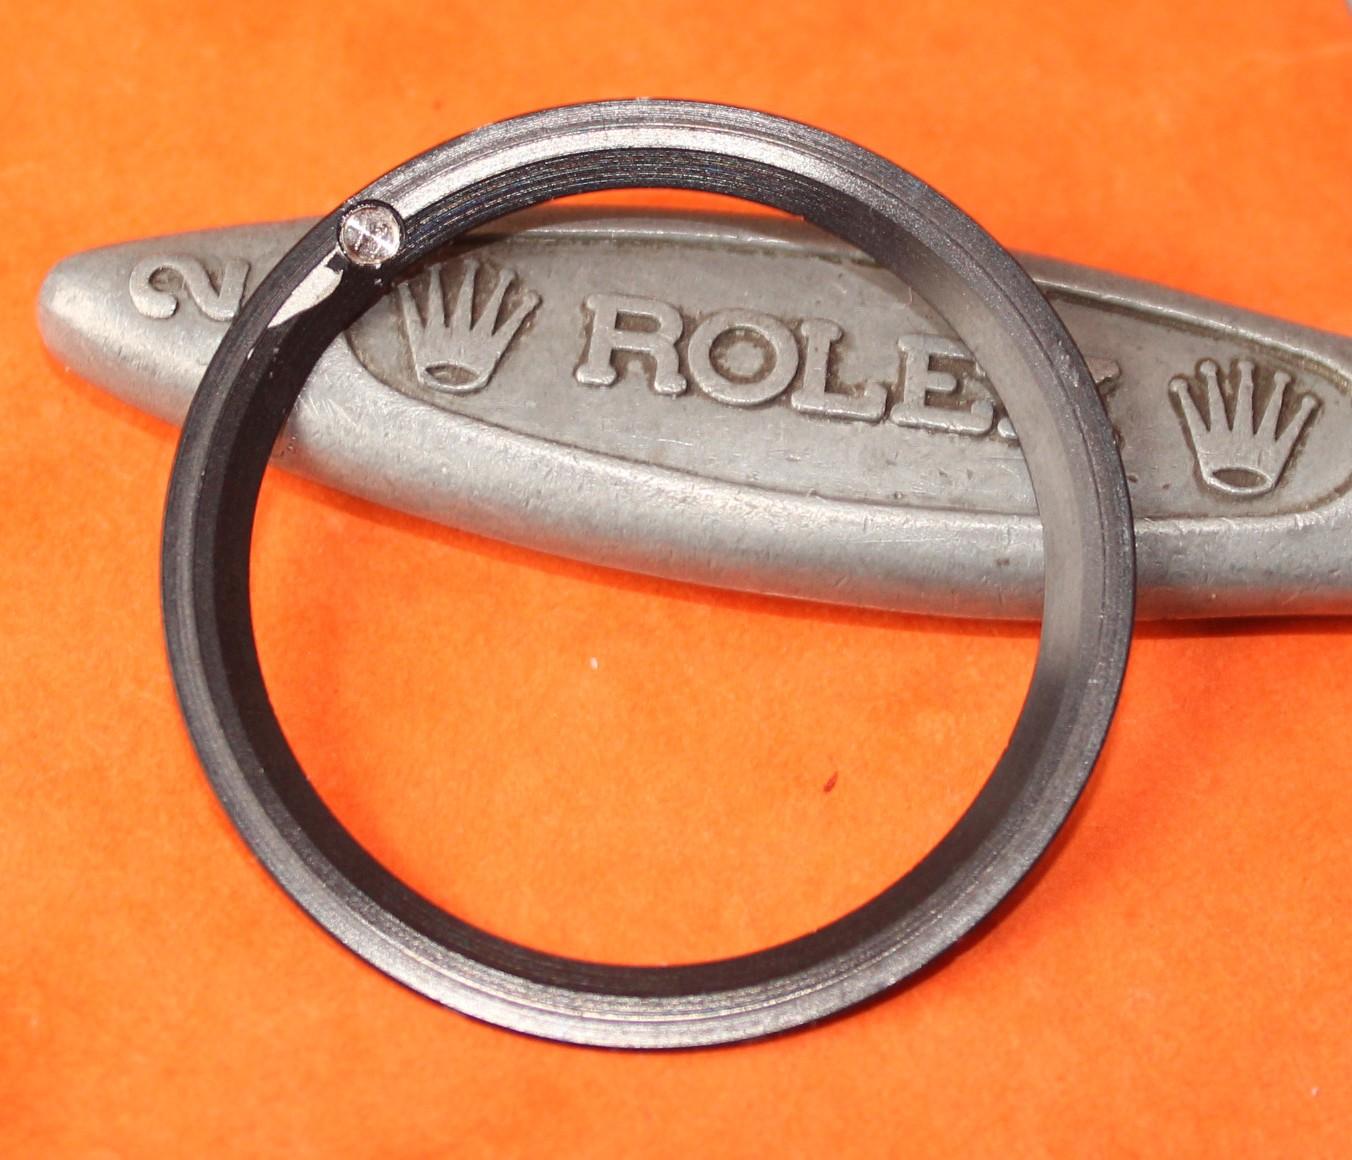 Rolex black color Submariner date 16800, 168000, 16610 watches bezel Insert  Inlay & tritium dot